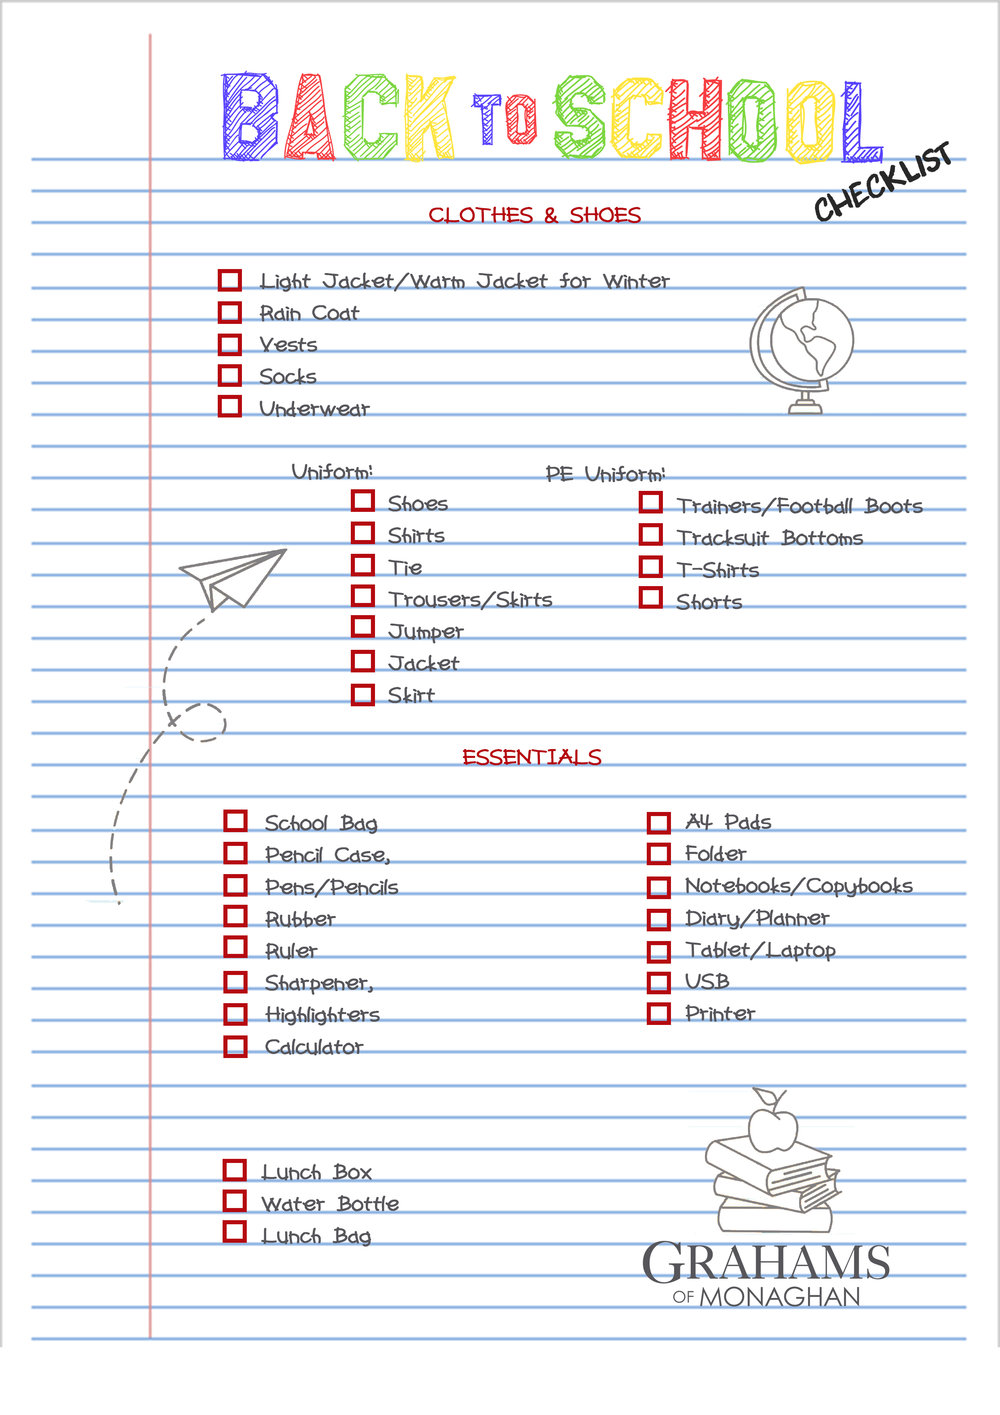 Back to school Checklist.jpg